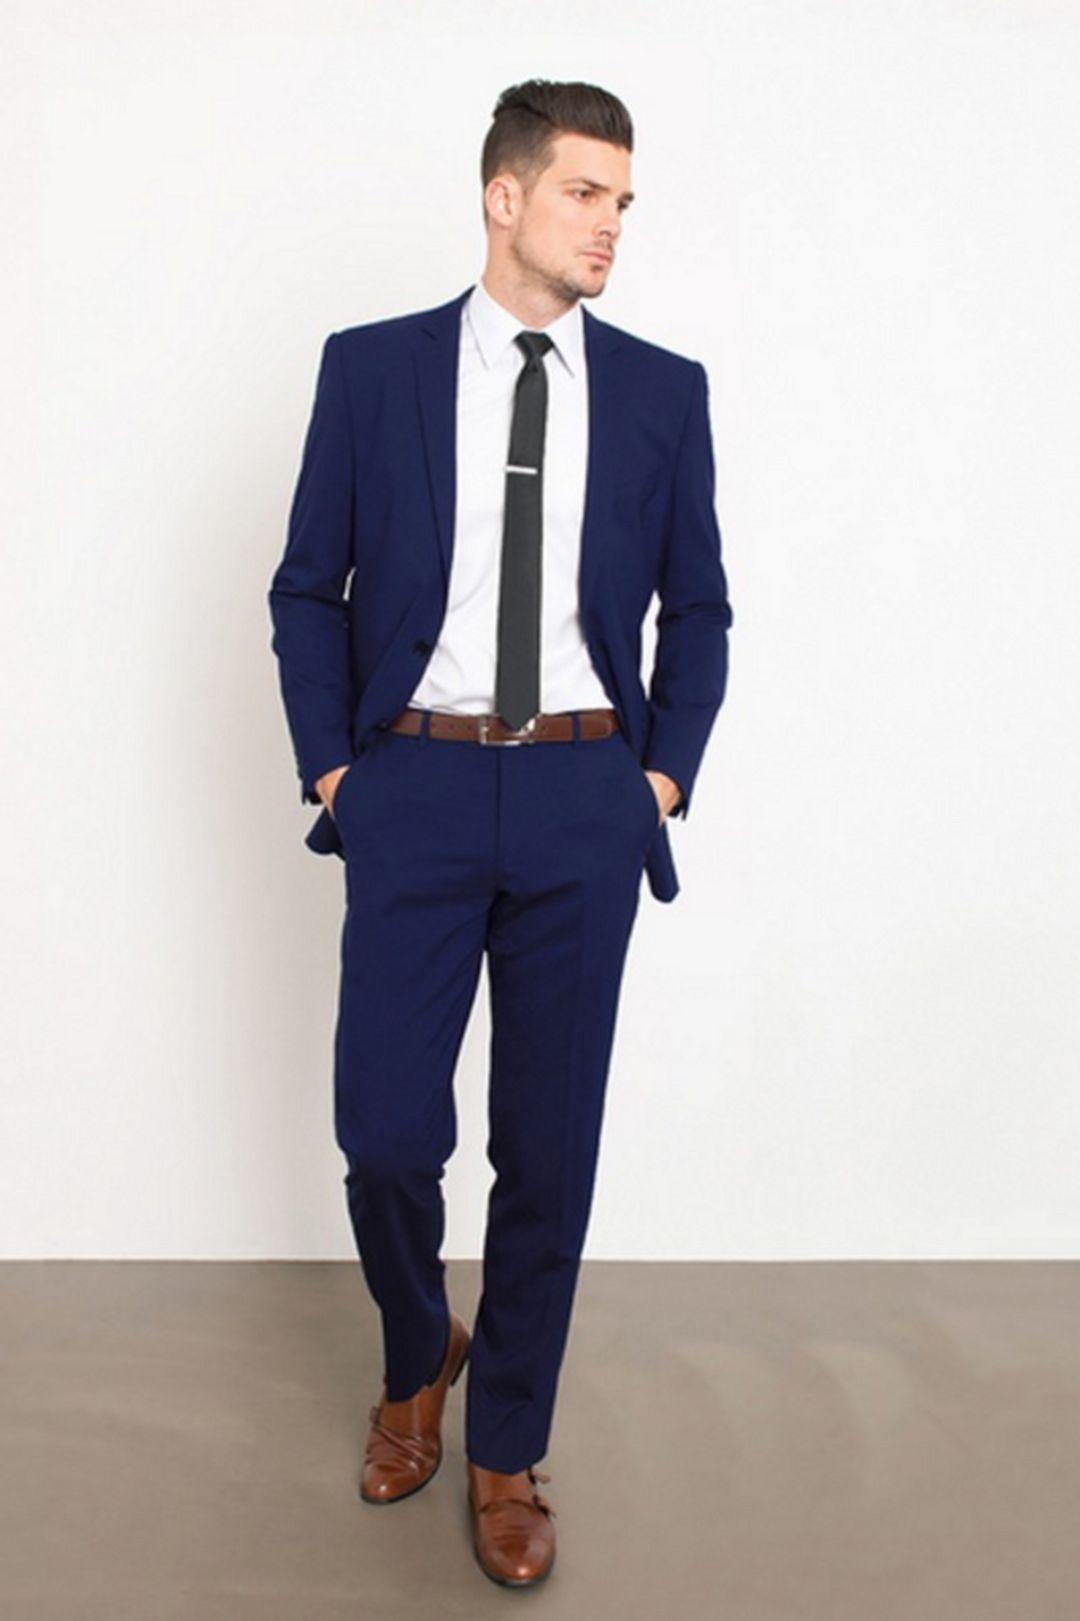 55 Best Men S Suit Ideas For Looks Handsome